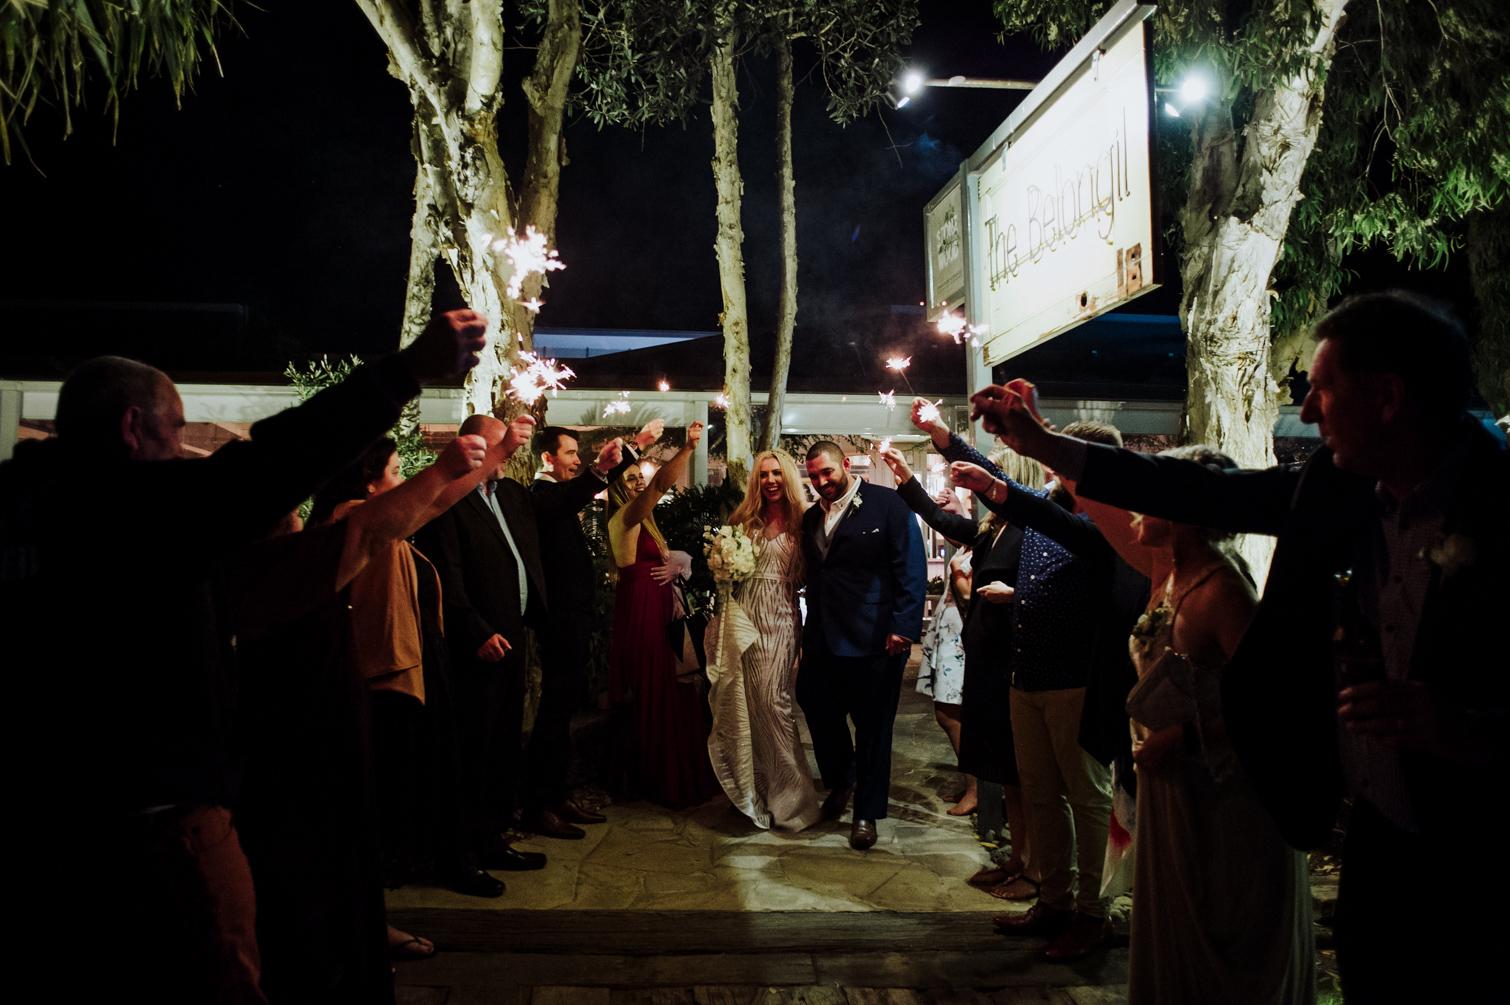 The_Belongil_Byron_Bay_Weddings_New_Black_Studios-263.jpg